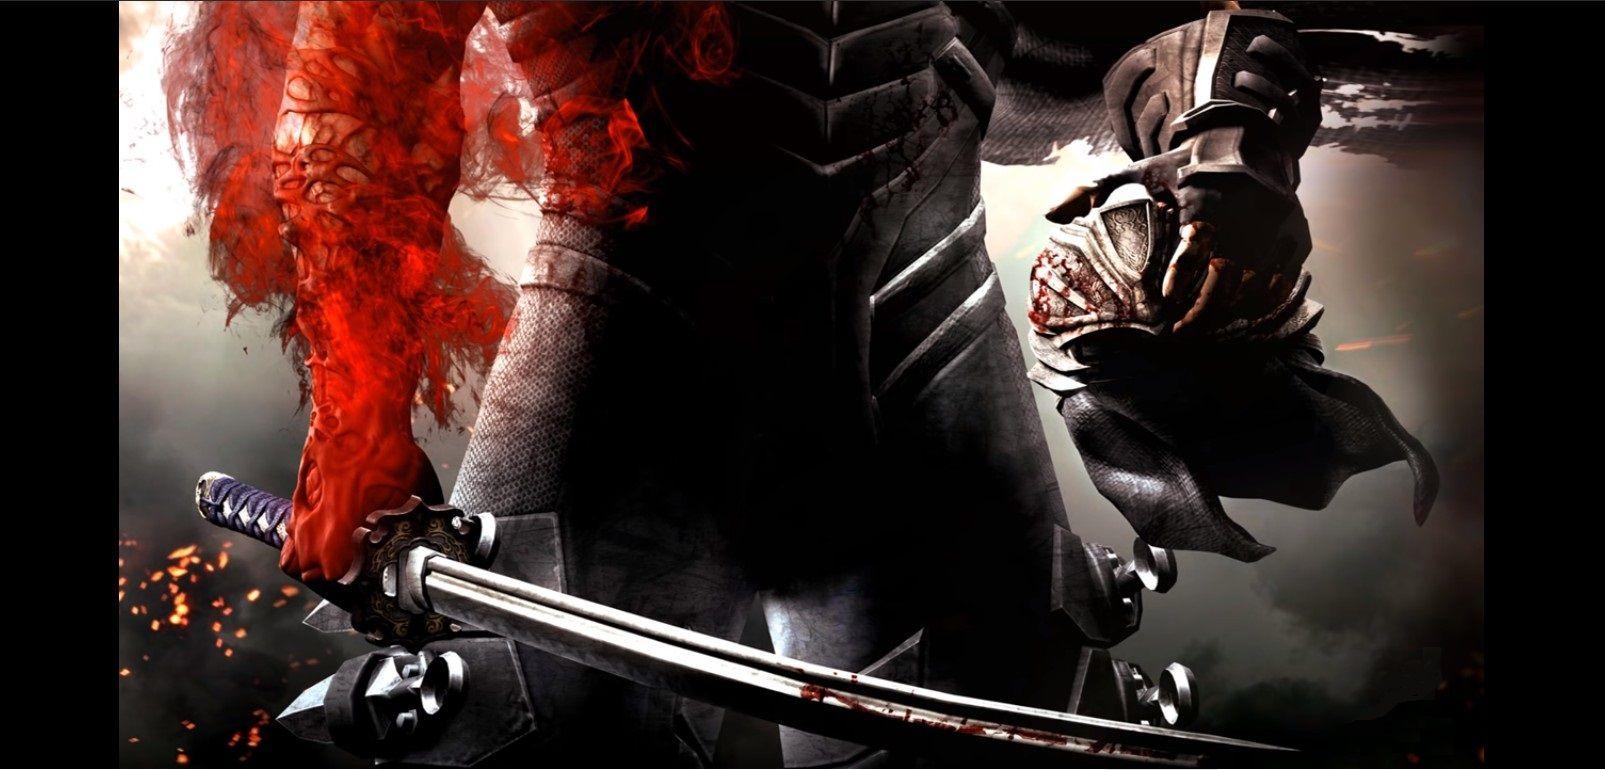 Pin By Tim Moore On Dark Souls 2 Cool Ninja Wallpapers Ninja Wallpaper Ninja Gaiden